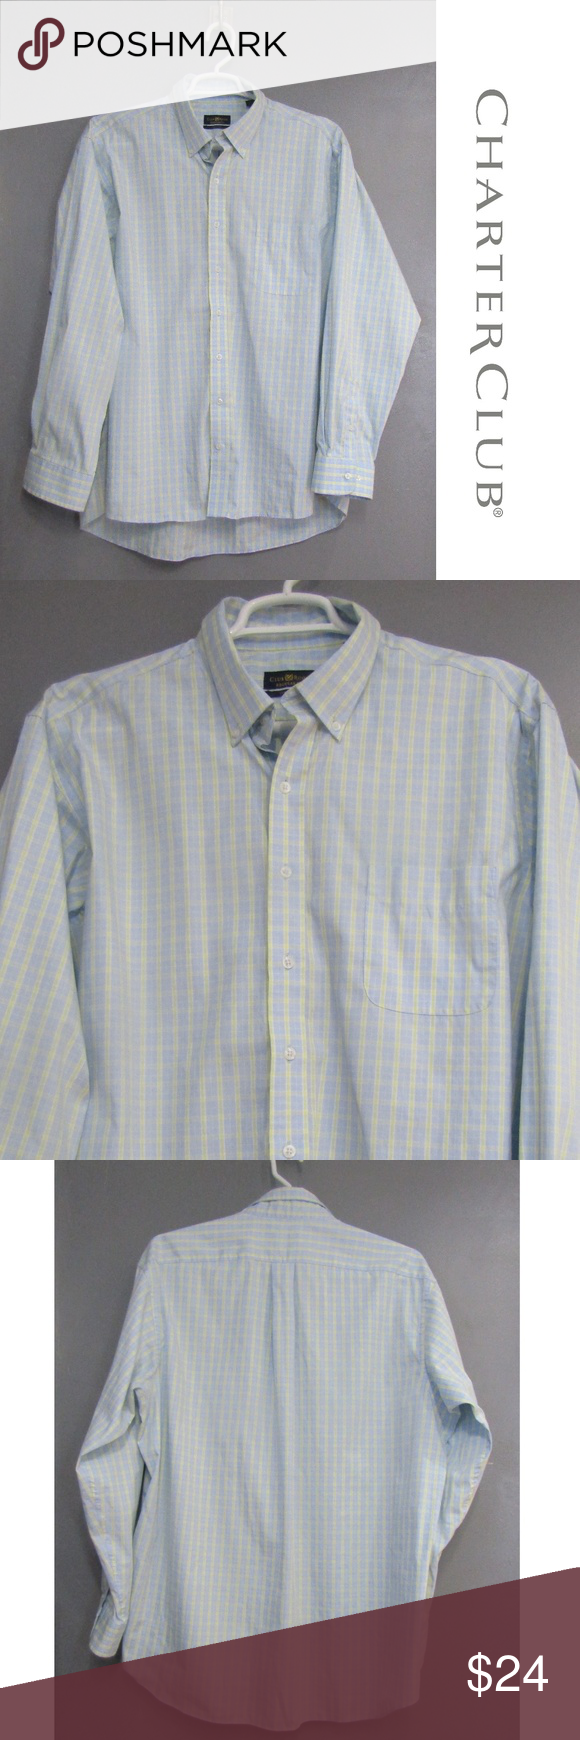 Club Room Mens Shirt Light Long Sleeve Button Down